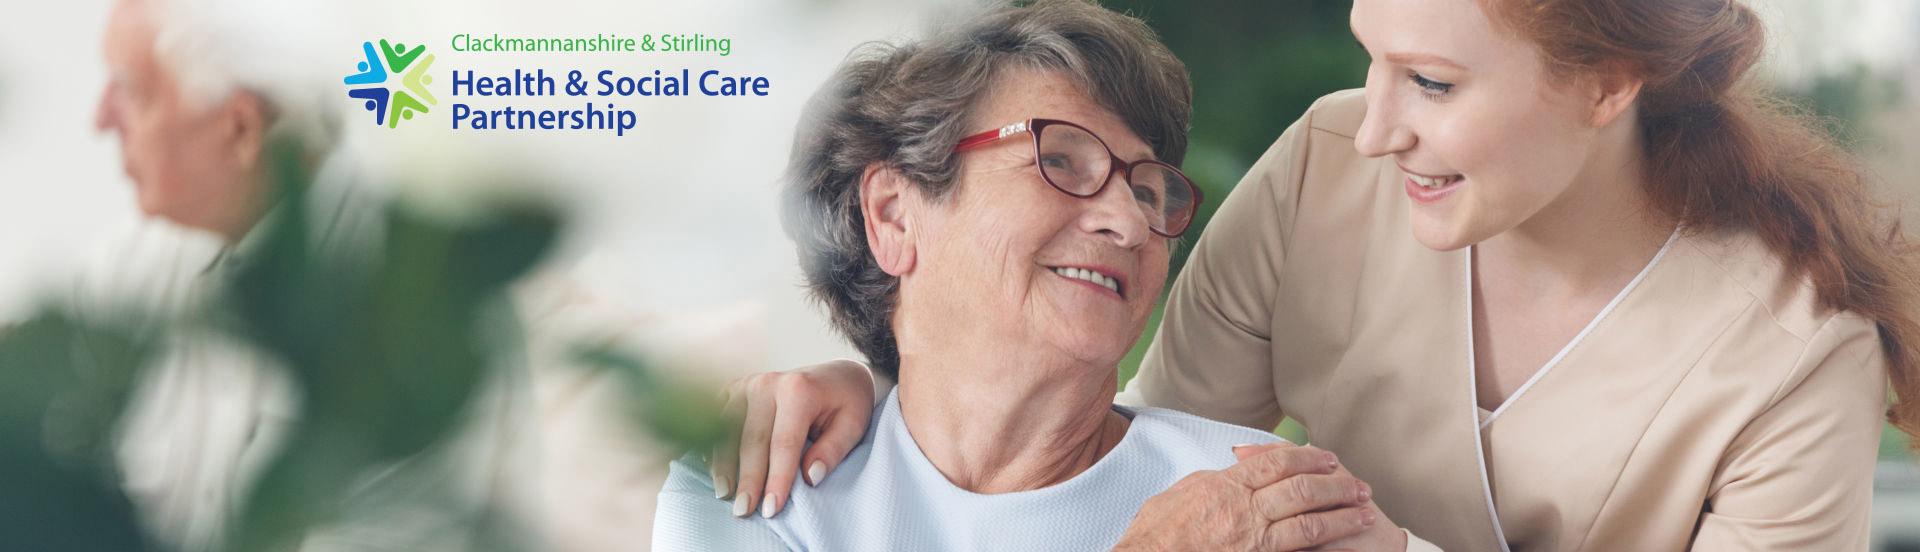 Clackmannanshire & Stirling Health & Social Care Partnership logo